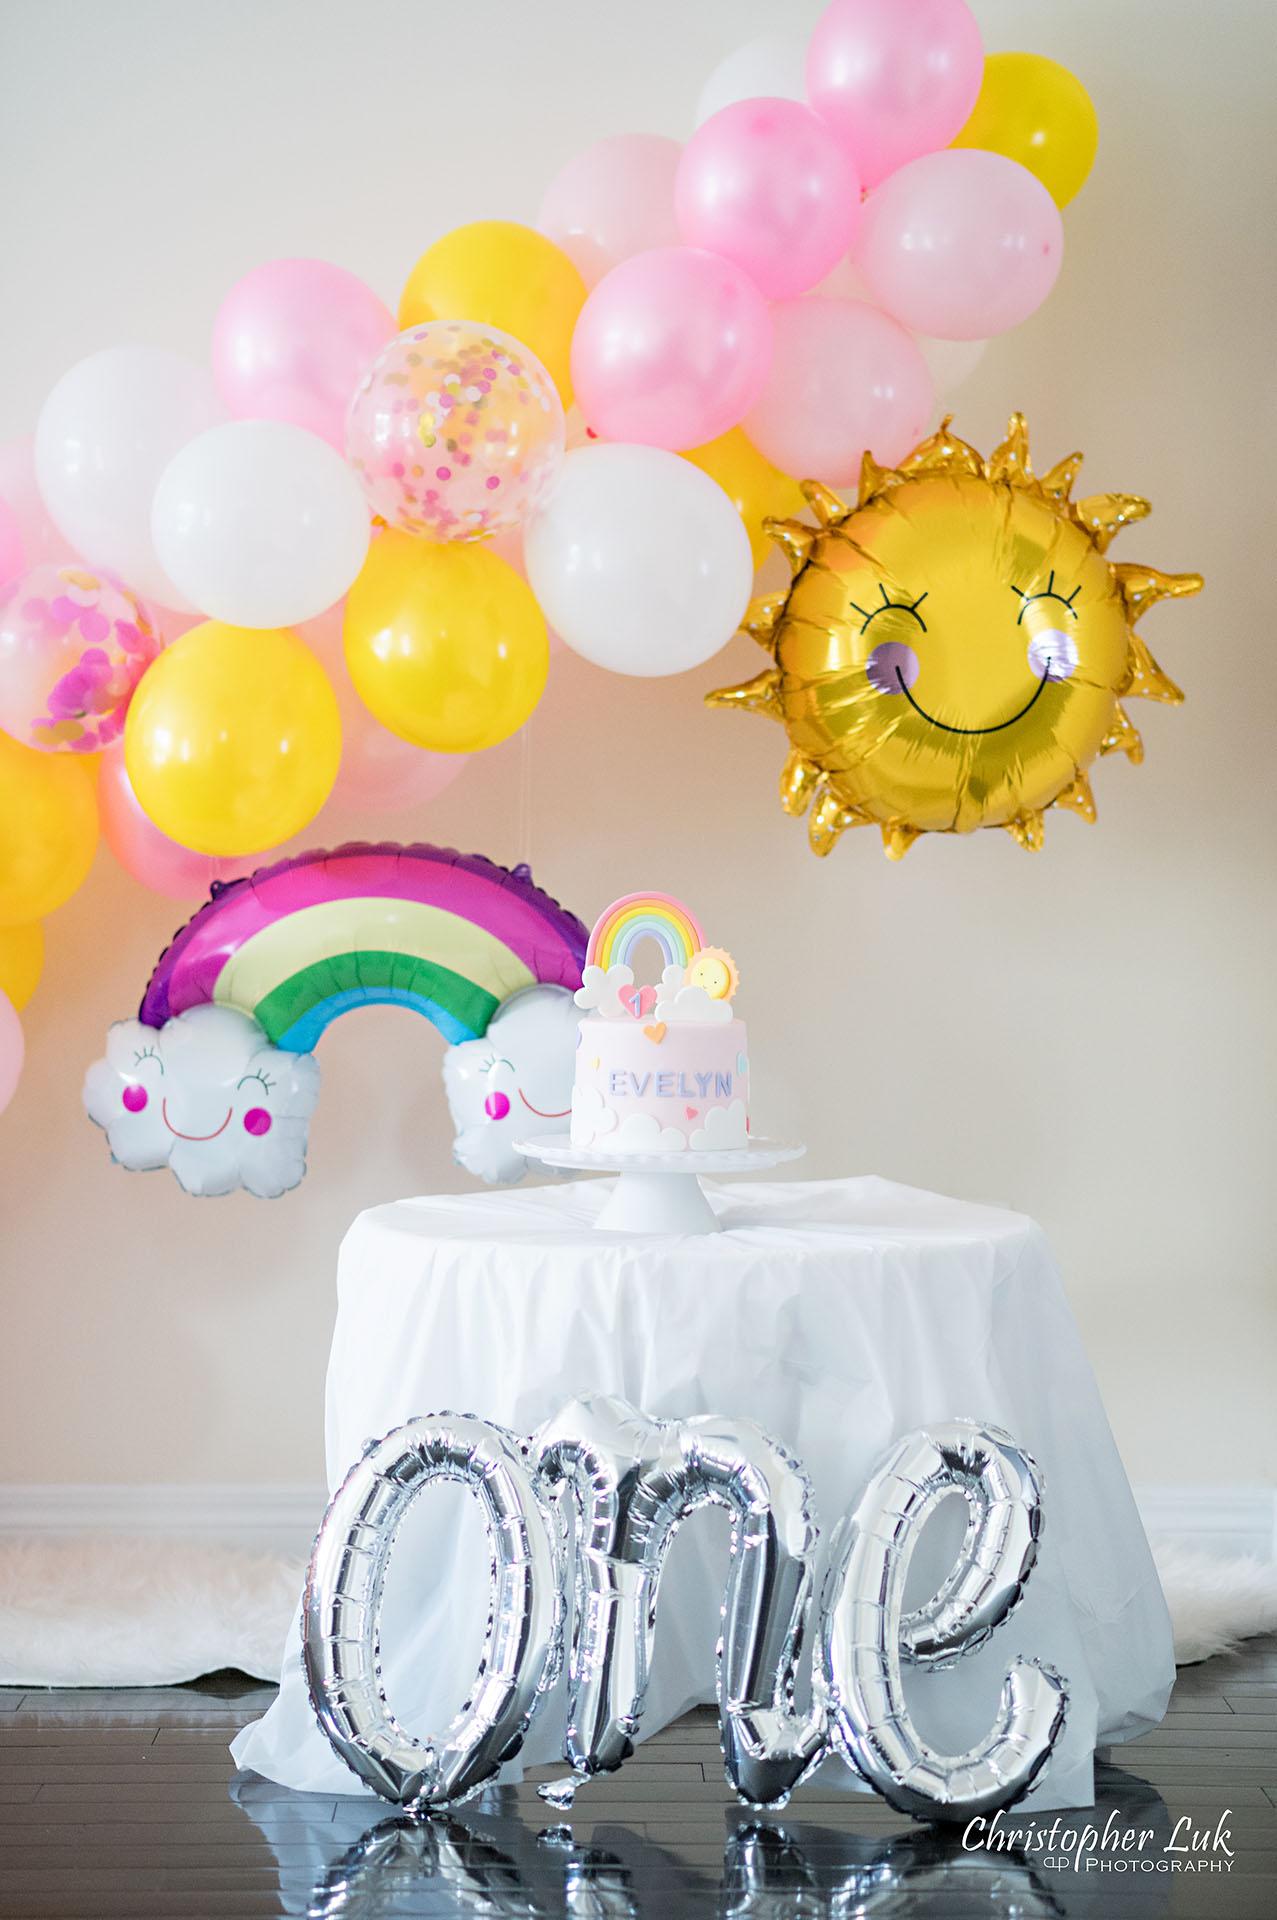 Christopher Luk Toronto Markham Family Photographer Baby Girl First Birthday Balloon Arch Rainbow Pink Hat Rainbow Sun Cake Decor